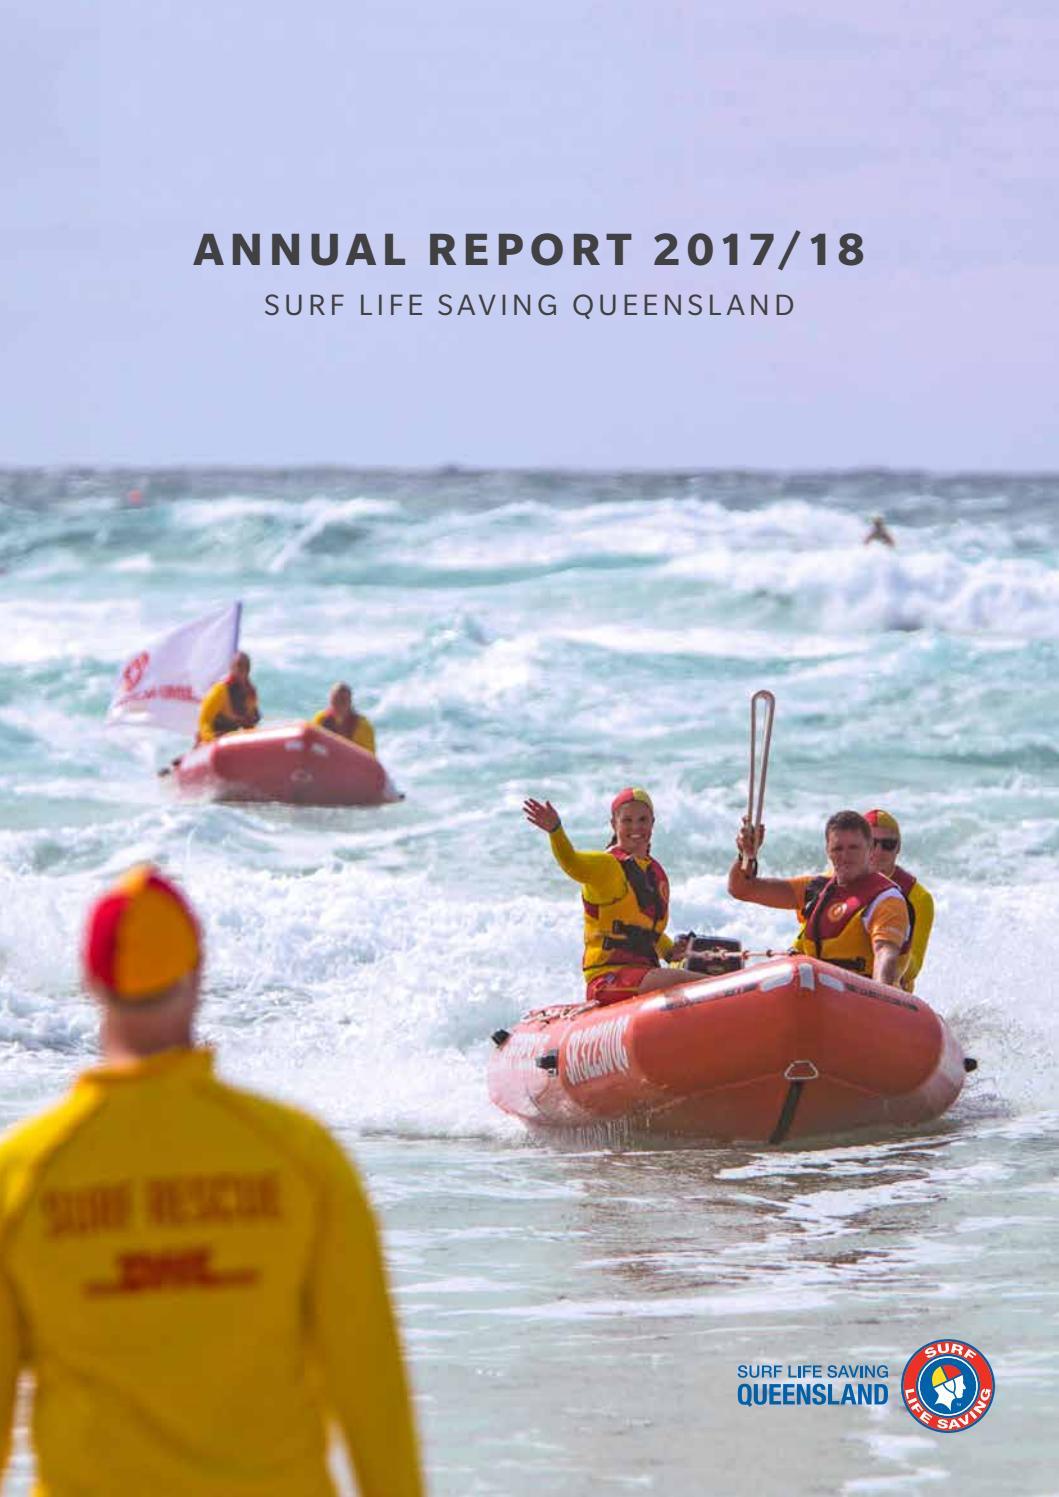 c70390e200f8 Surf Life Saving Queensland Annual Report 2017 18 by Surf Life Saving  Queensland - issuu